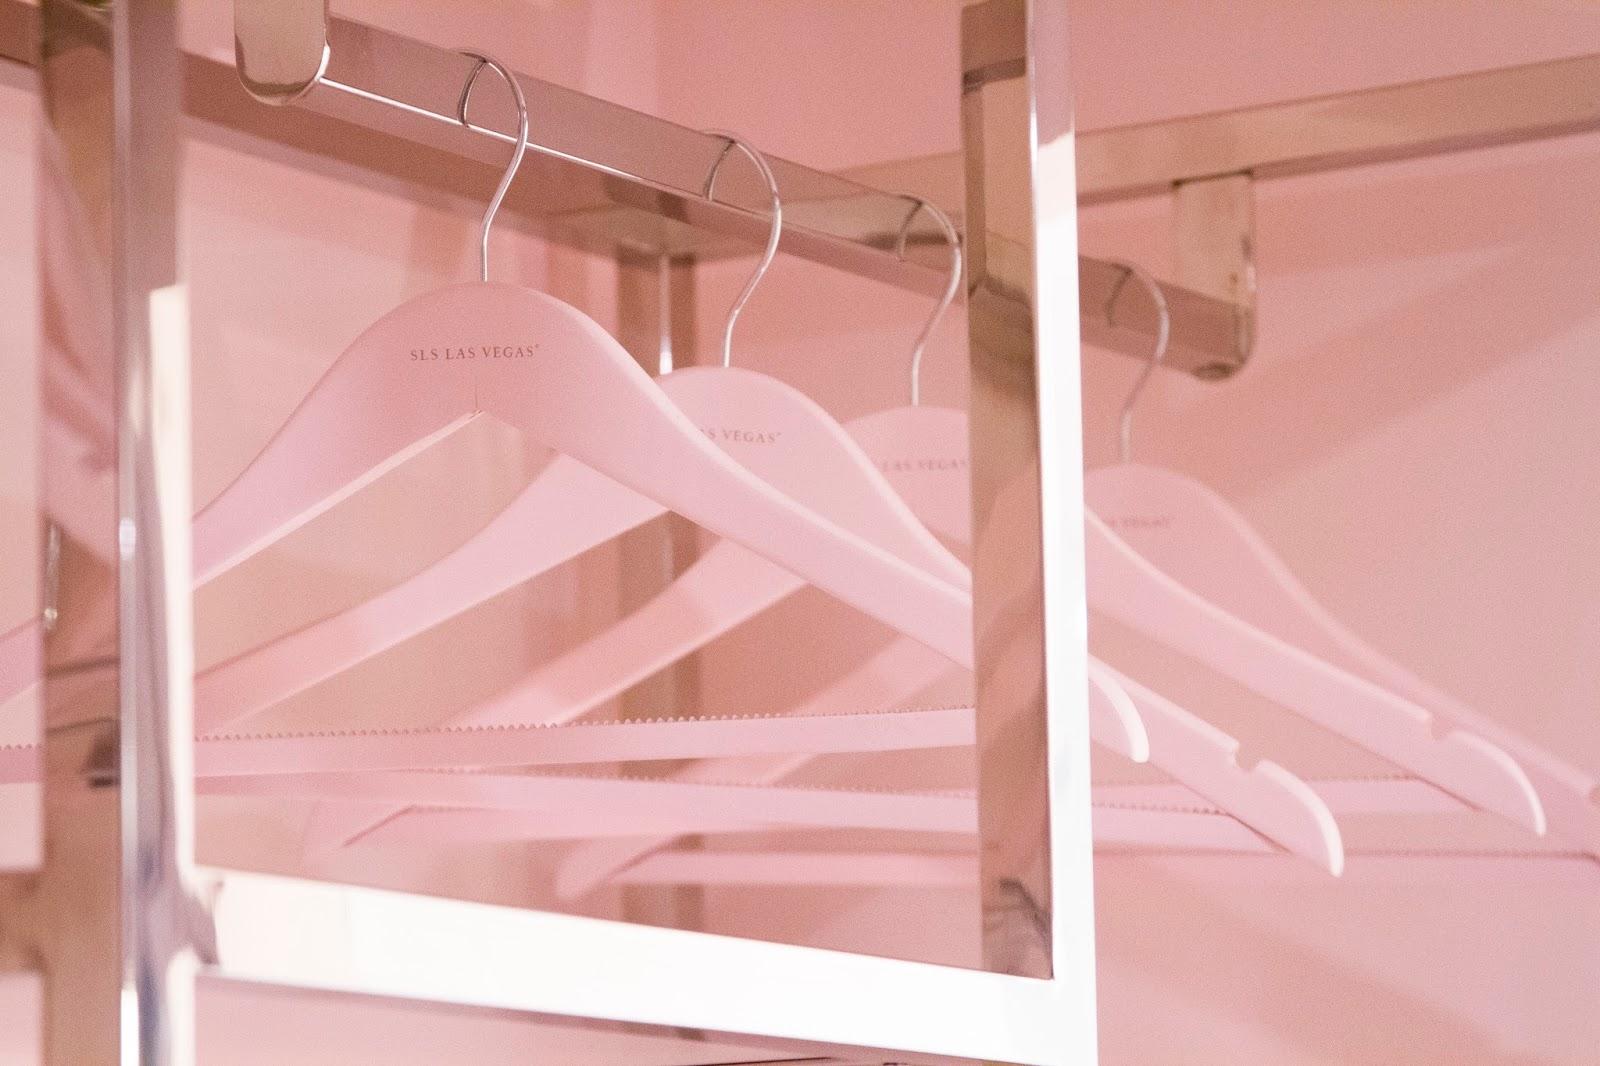 sls hotel las vegas luxe tower pink closet